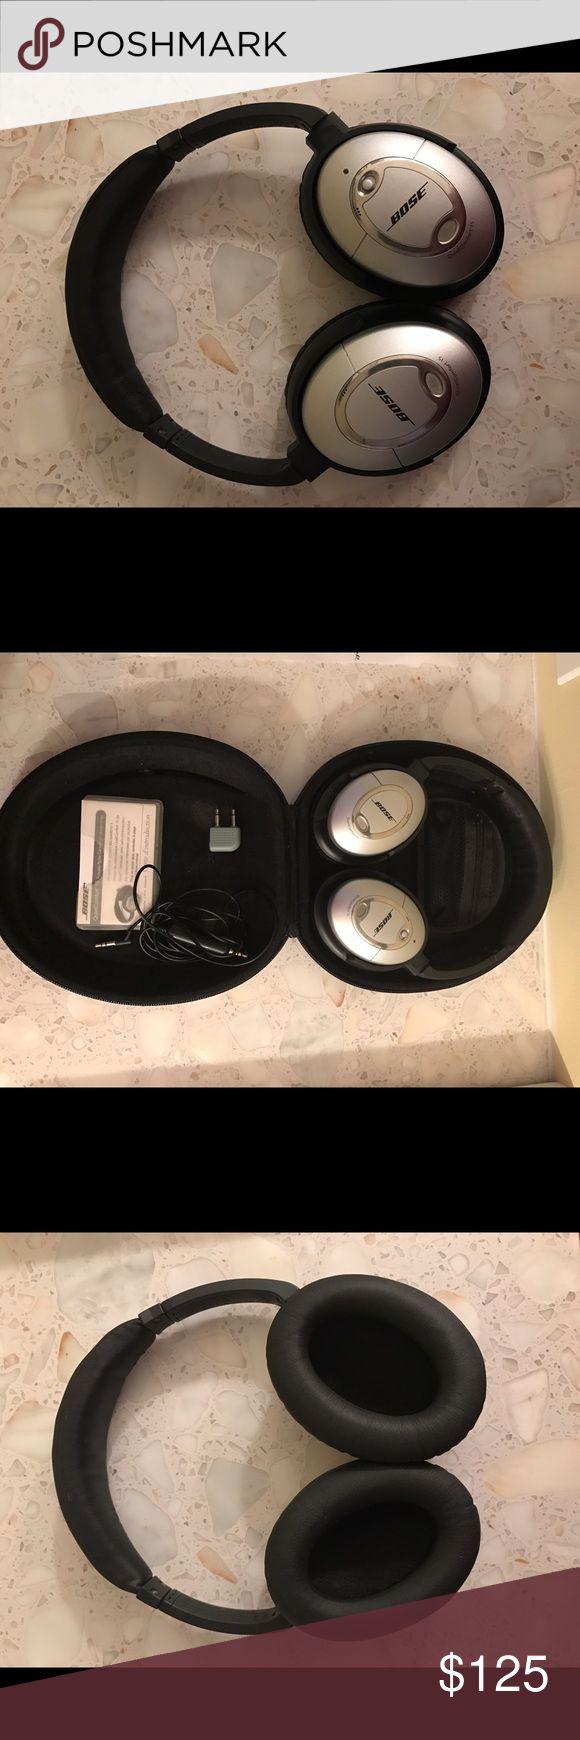 Bose QC15 Noise Cancelling Headphones Used Bose QC15 Noise Canceling Headphones. Only getting rid of to upgrade. Slight wear on headband. Bose Other